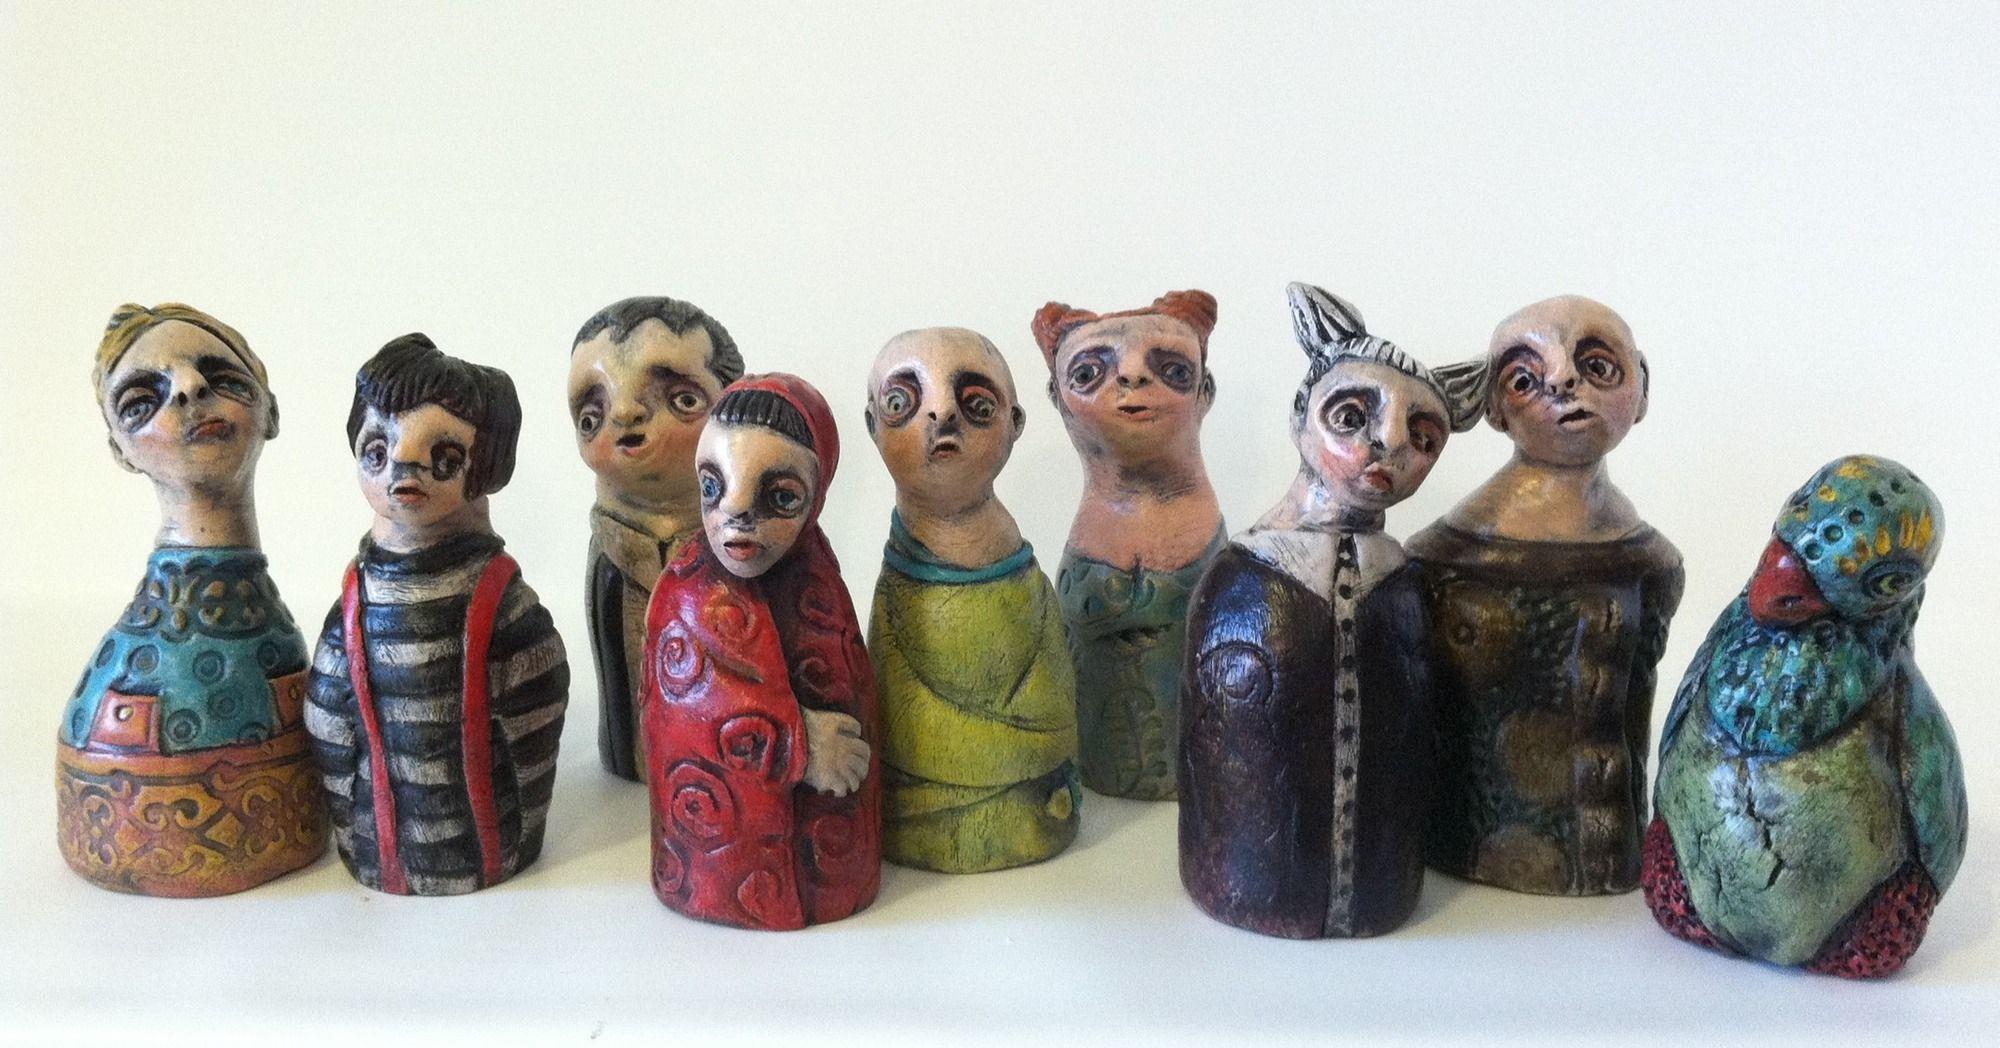 gallery evb•studio simply fabulous finger puppets Art